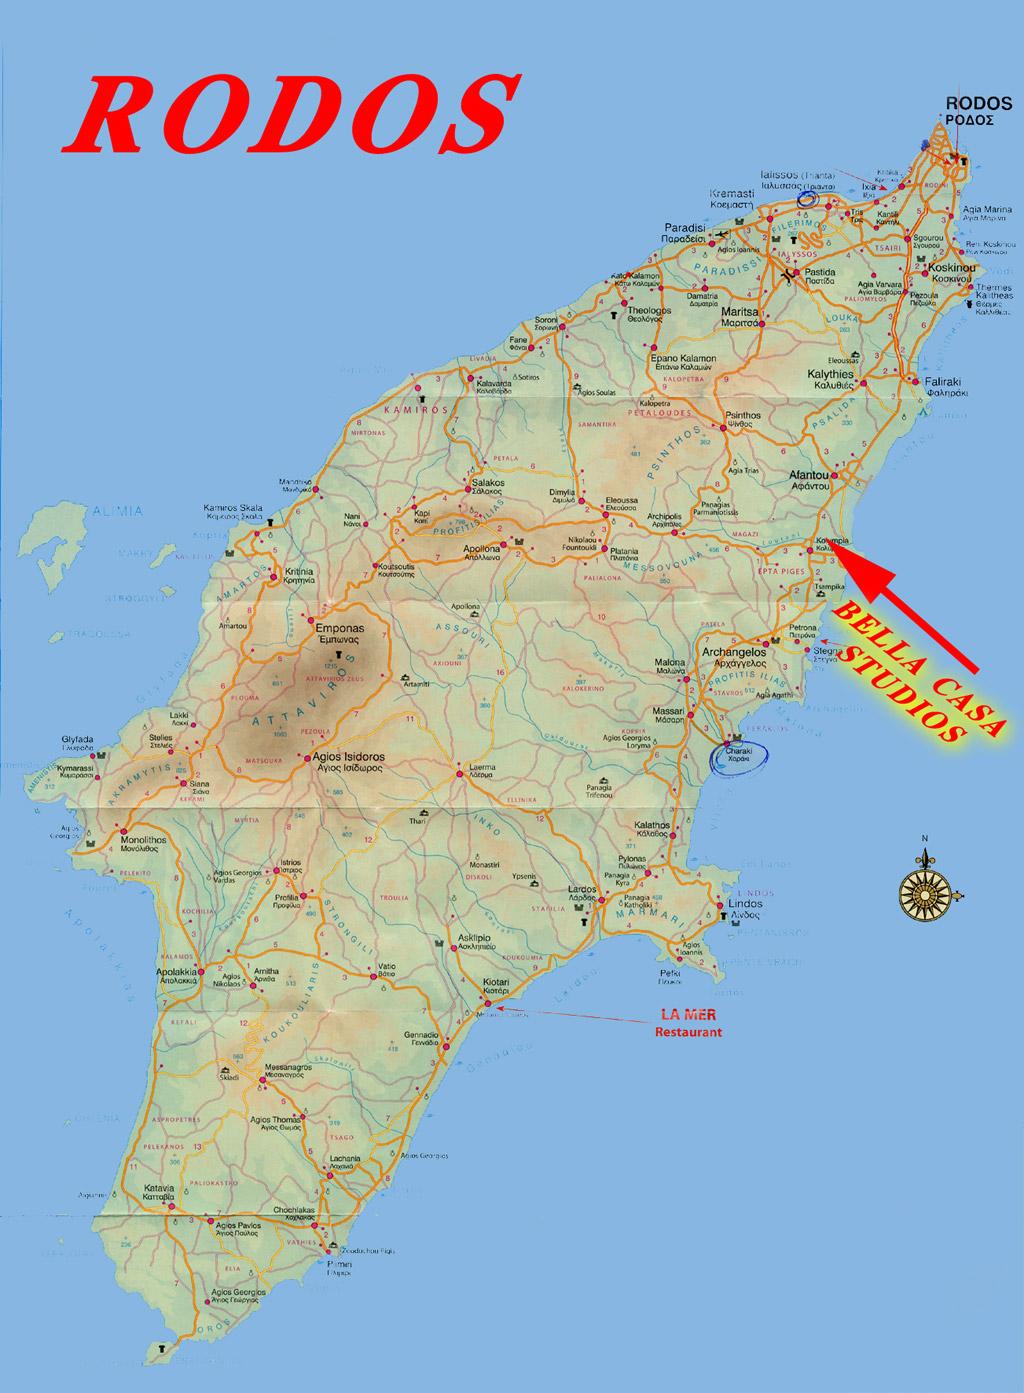 Recko Kompletni Pruvodce Rhodos Mapy Ostrova Rhodos